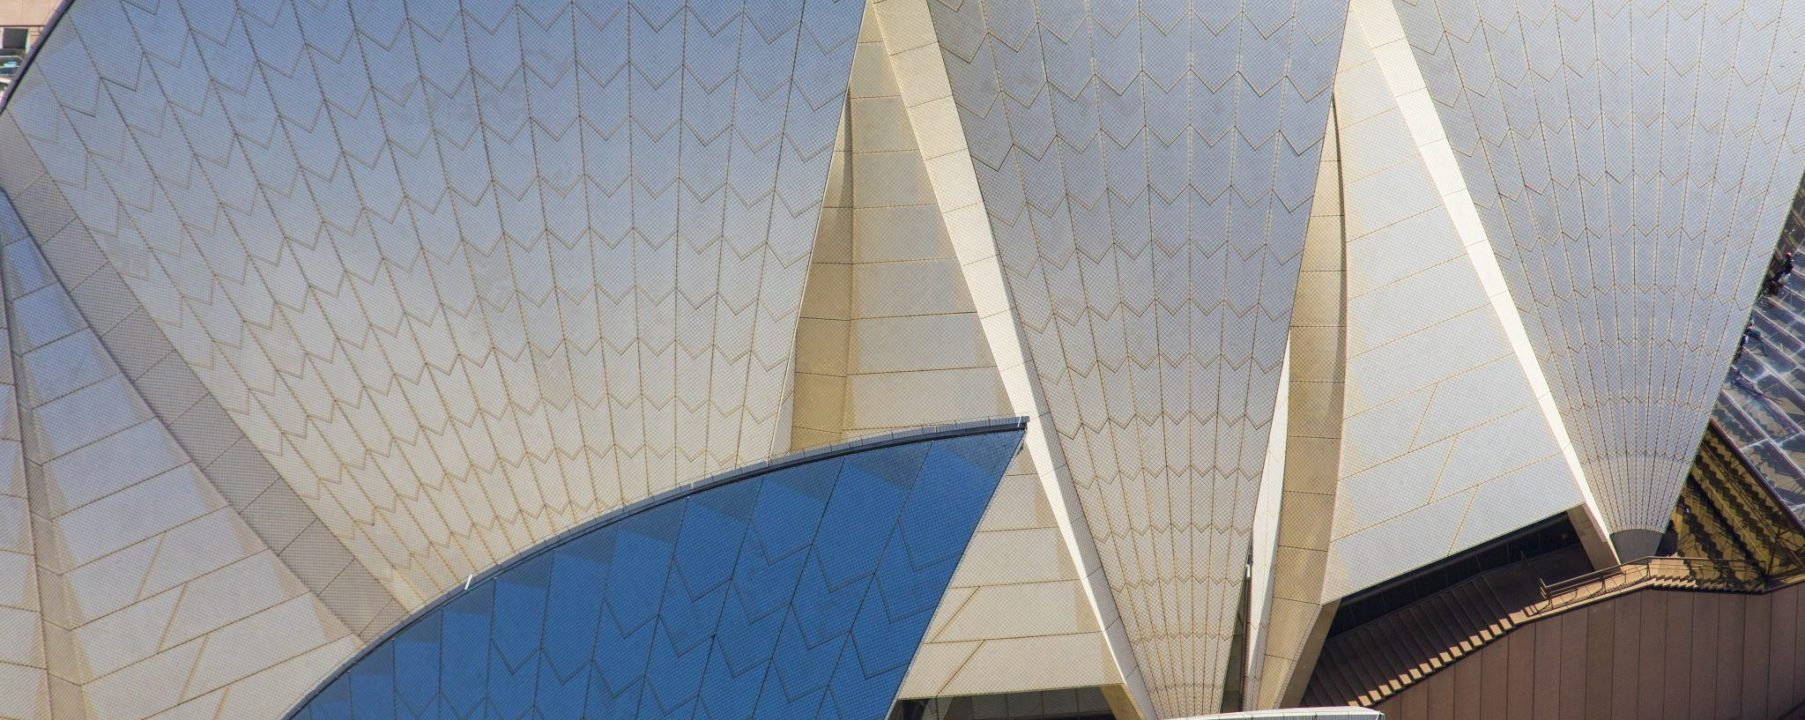 Sydney Opera House Aerial Photo